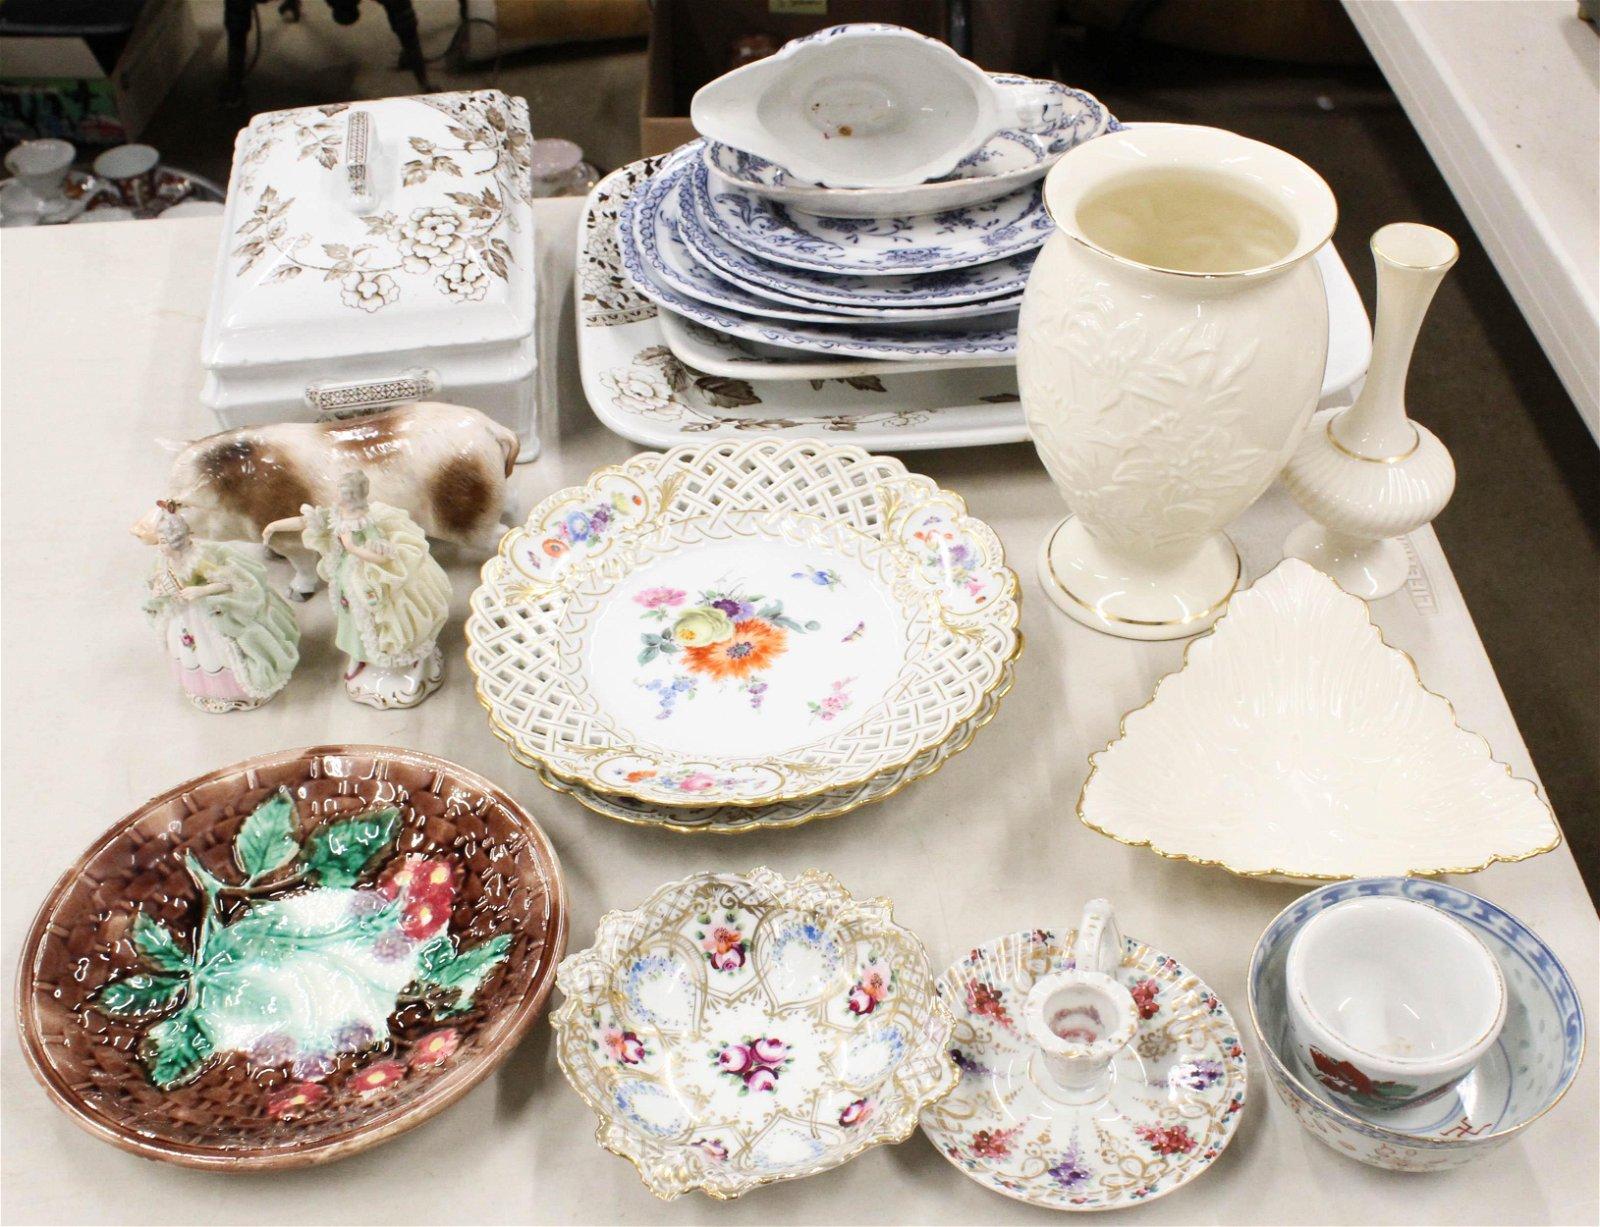 Meissen Porcelain Plates, Other Tableware